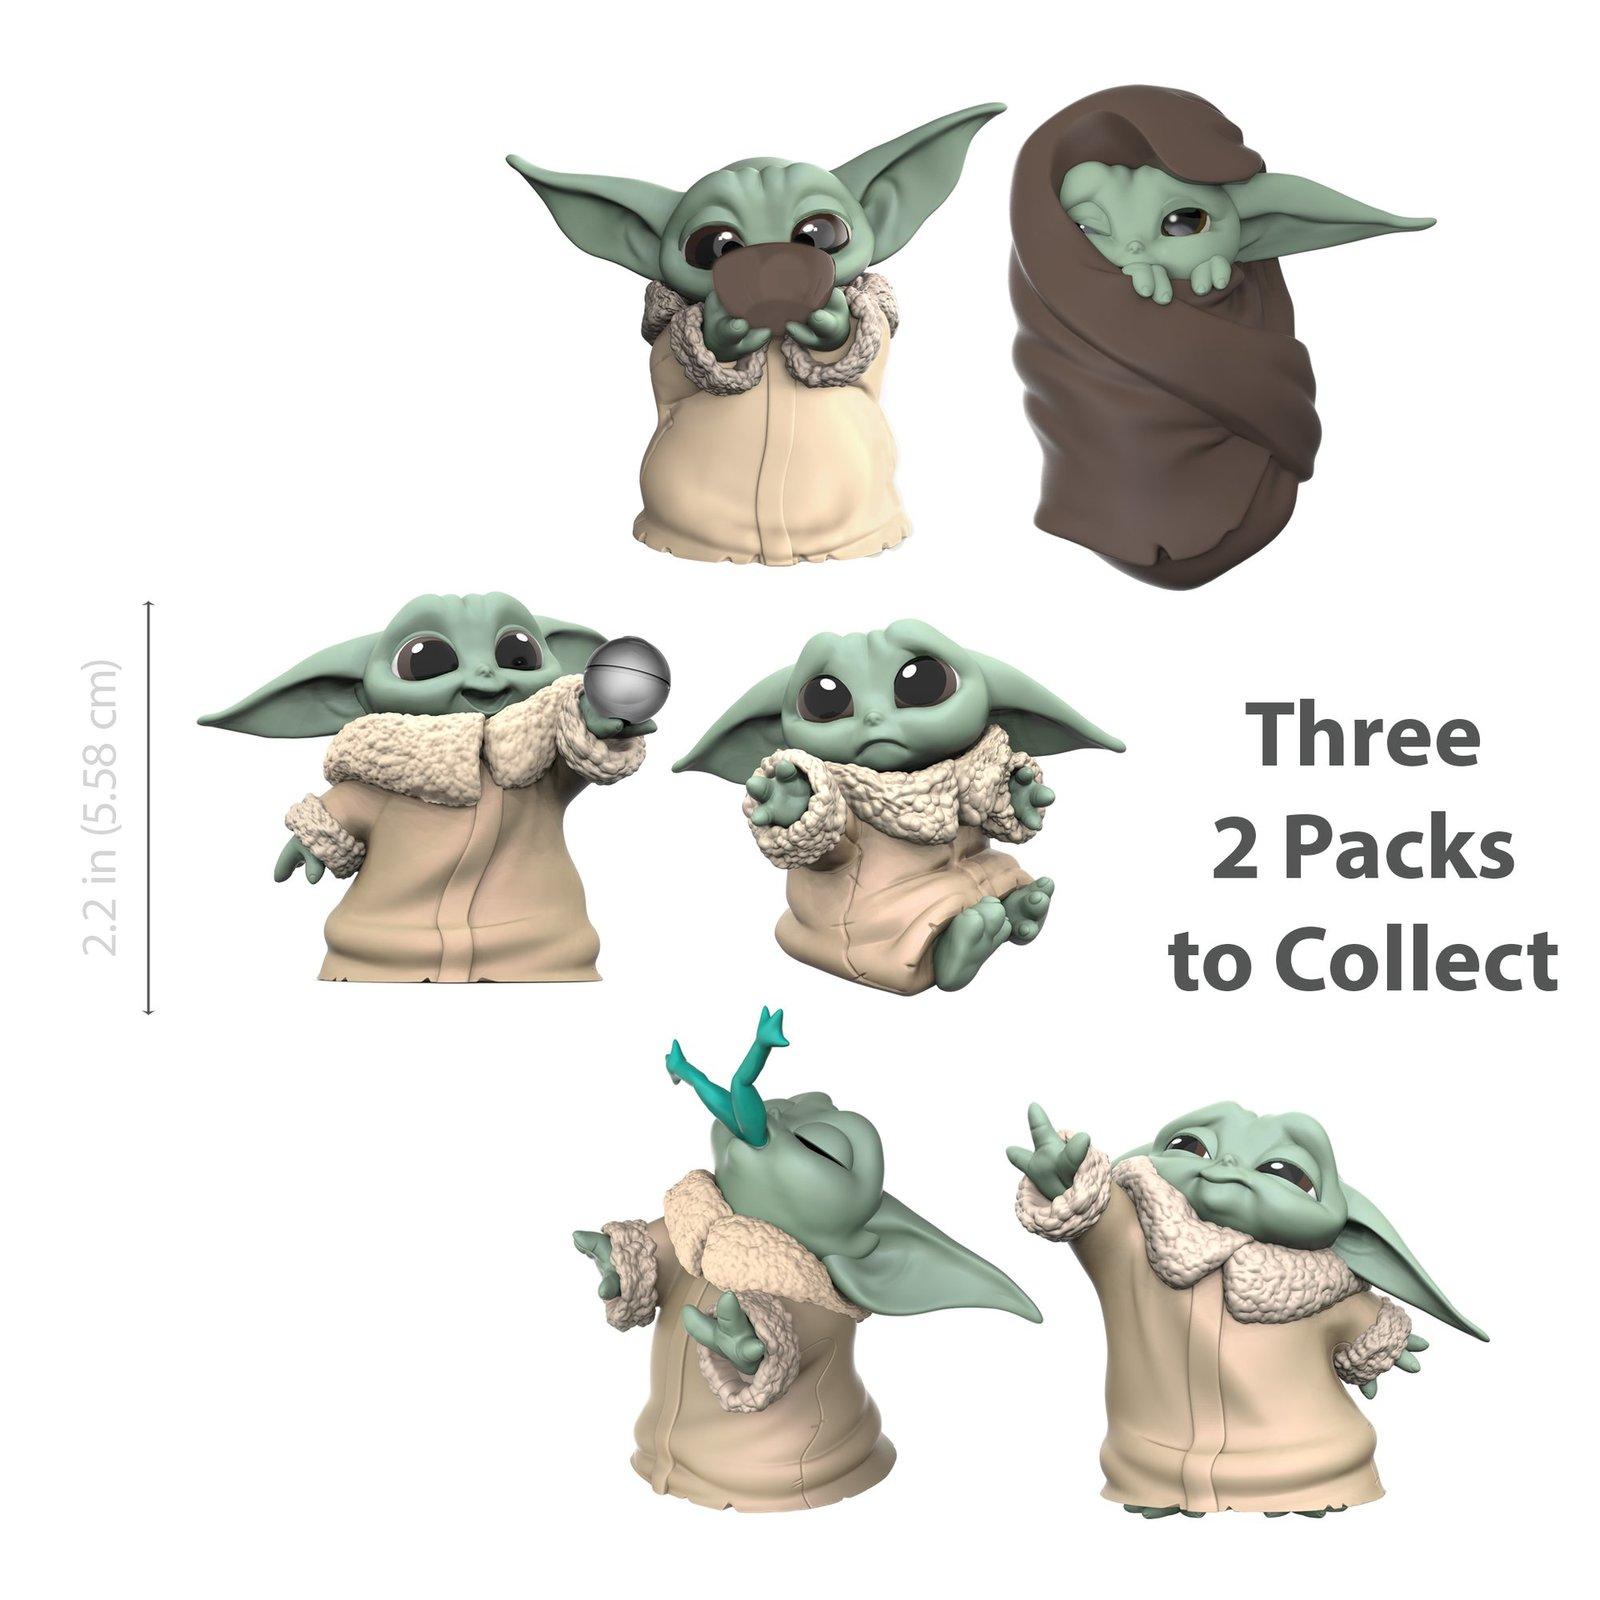 Star Wars: The Child - Soup Blanket image